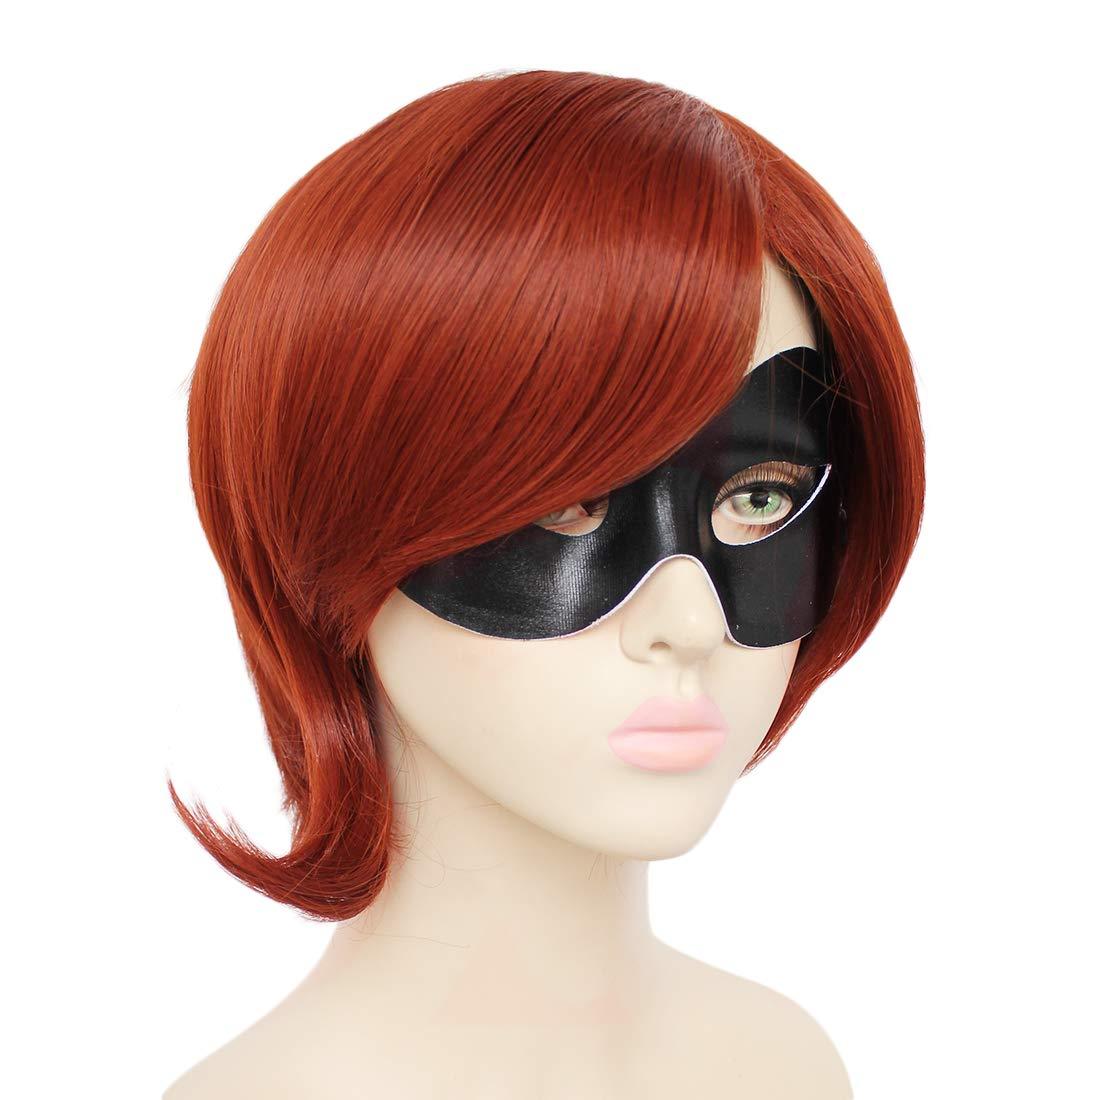 Amazon.com: JoneTing Peluca de Cosplay marrón peluca corta ...